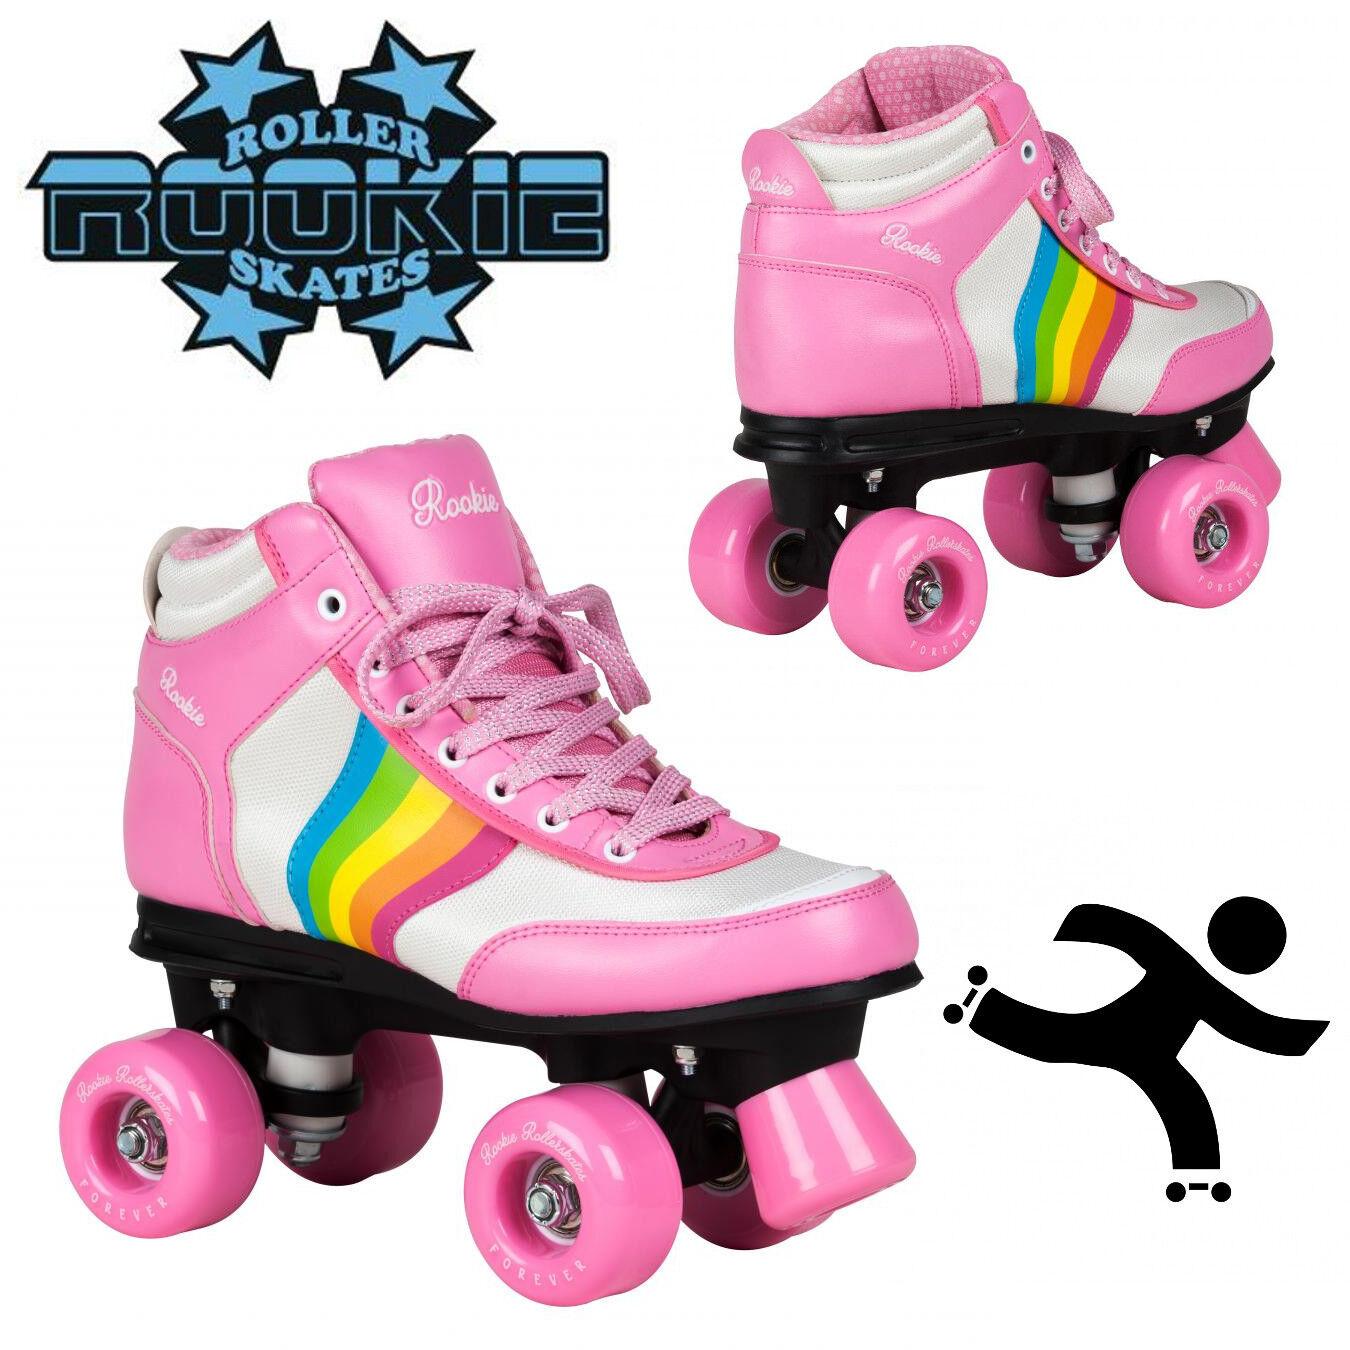 Rookie Girls Forever Rainbow V2 Girls Rookie Damenschuhe Roller Skates Rosa 47b78c